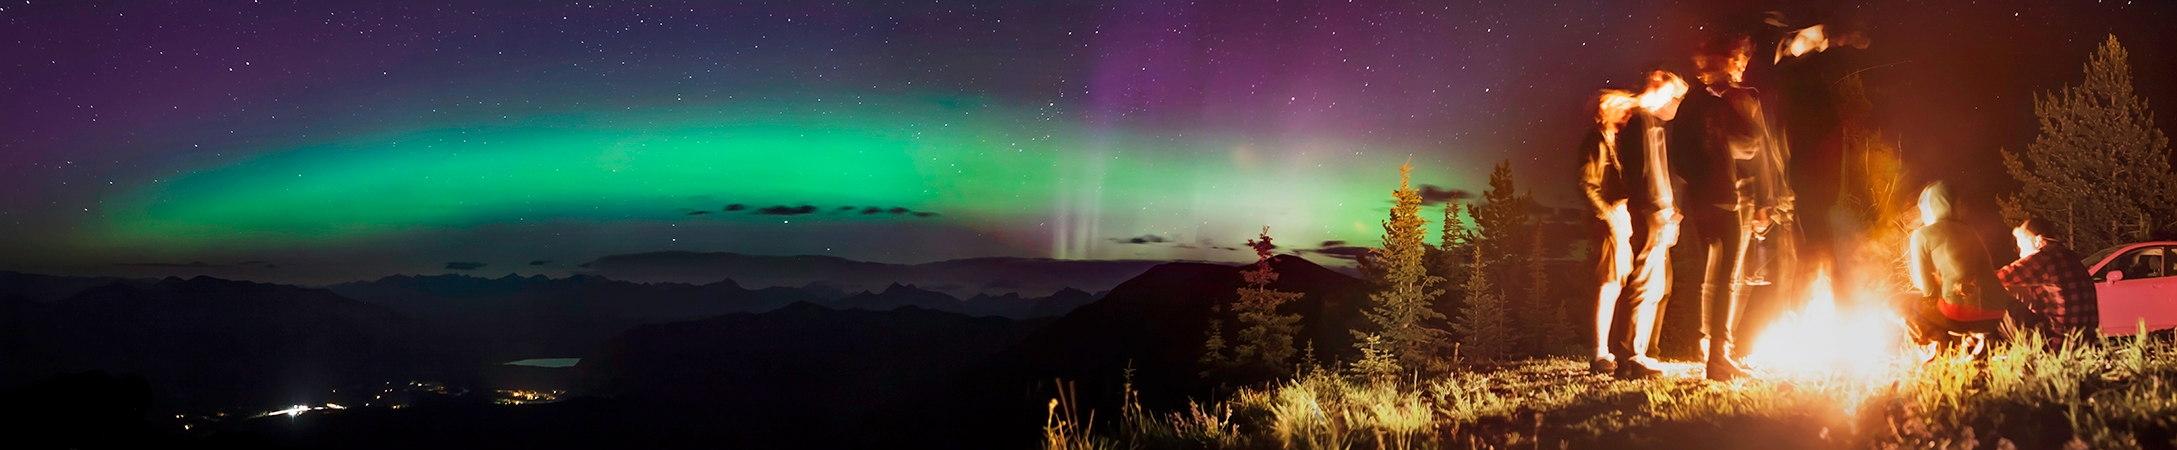 Aurora Over Desert Mountain, Montana